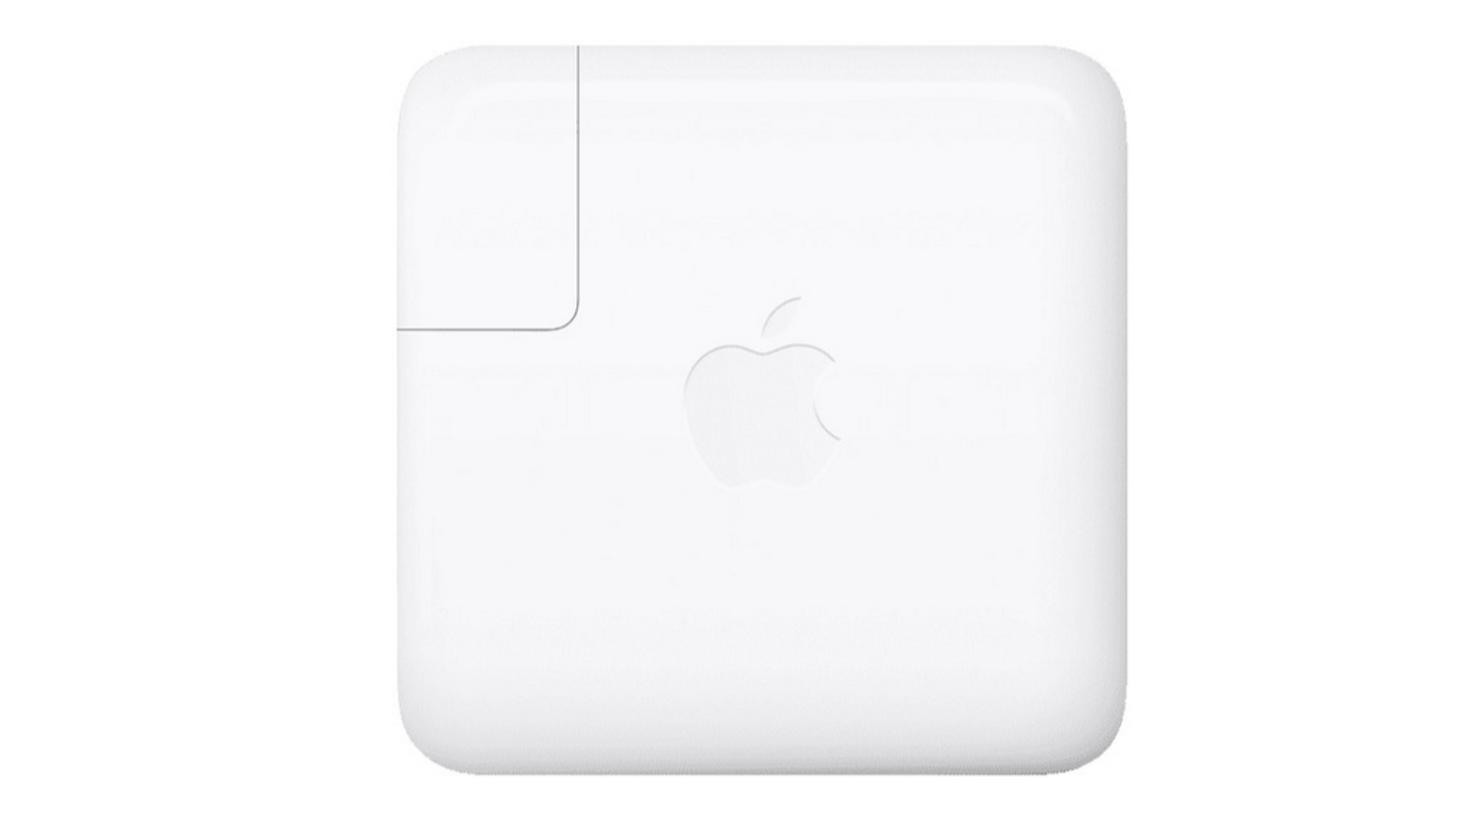 Apple USB-C power supply